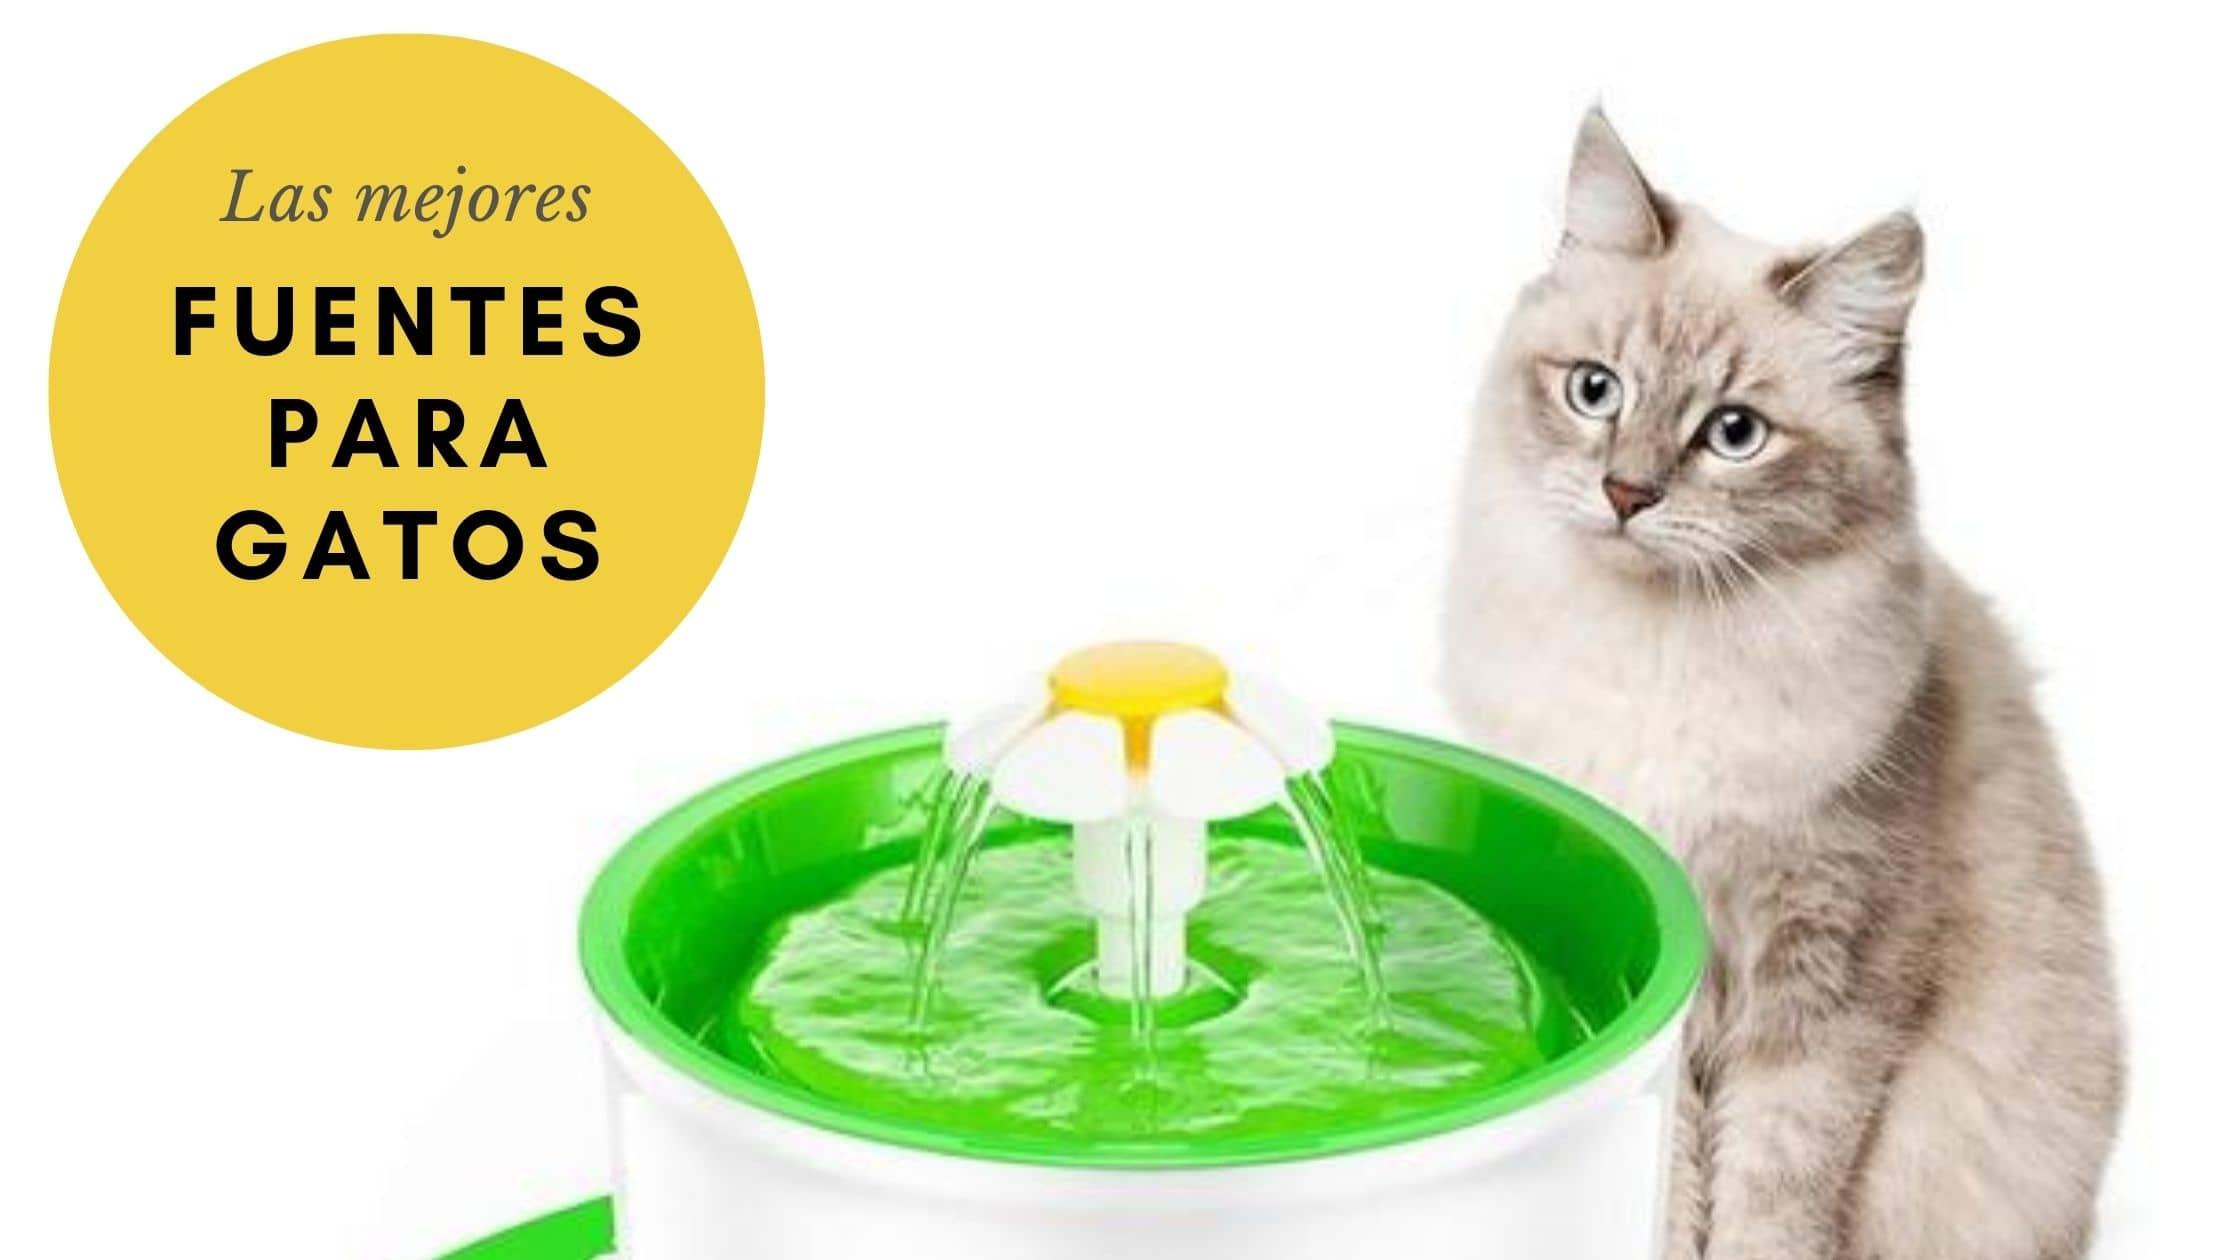 fuentes para gatos